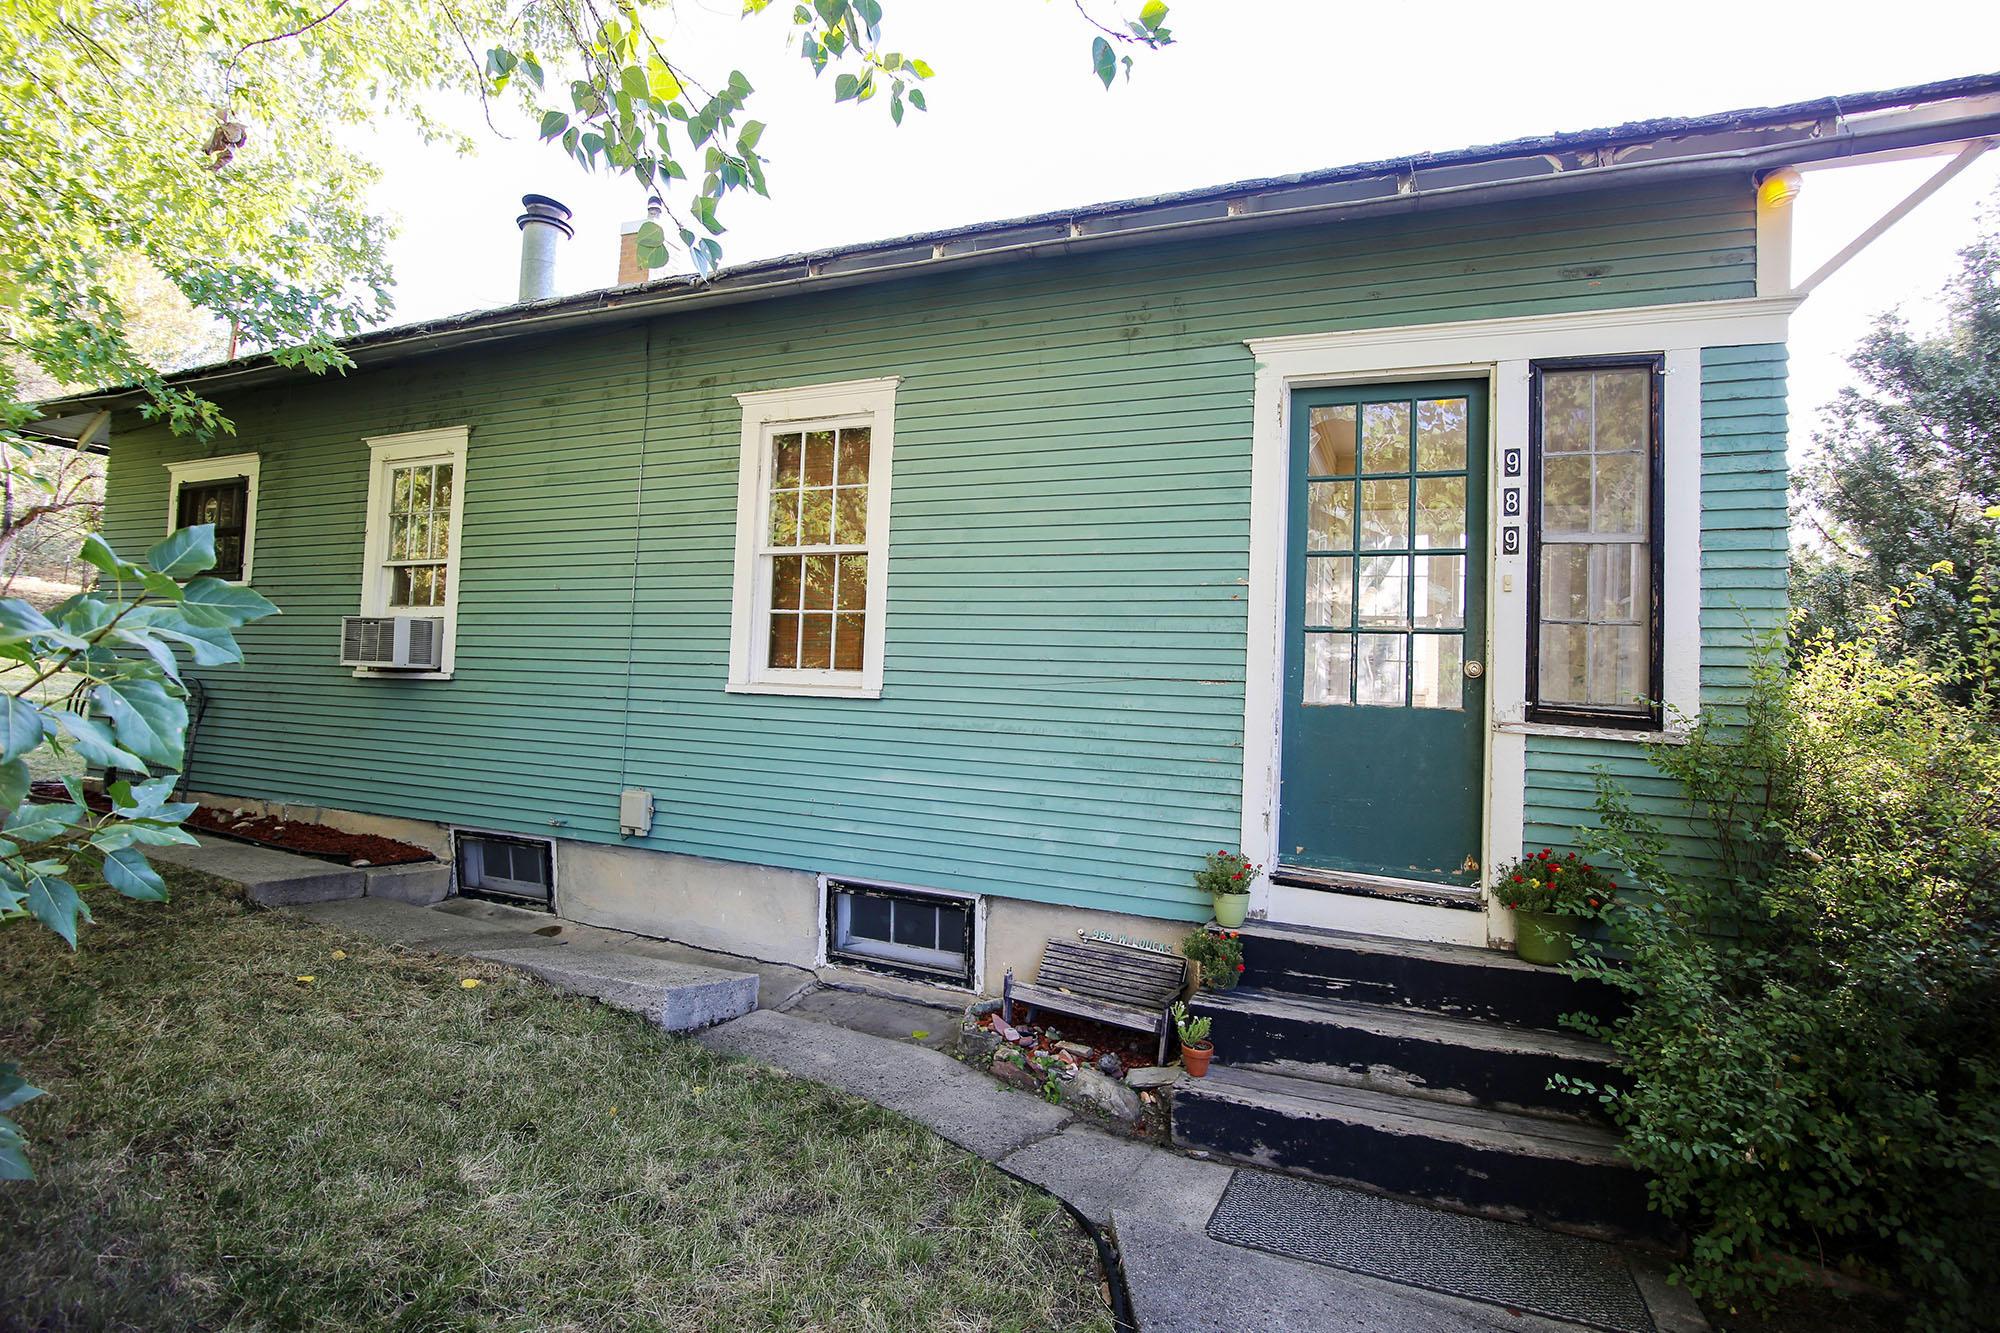 989 Loucks Street, Sheridan, Wyoming 82801, 2 Bedrooms Bedrooms, ,1 BathroomBathrooms,Residential,For Sale,Loucks,18-970